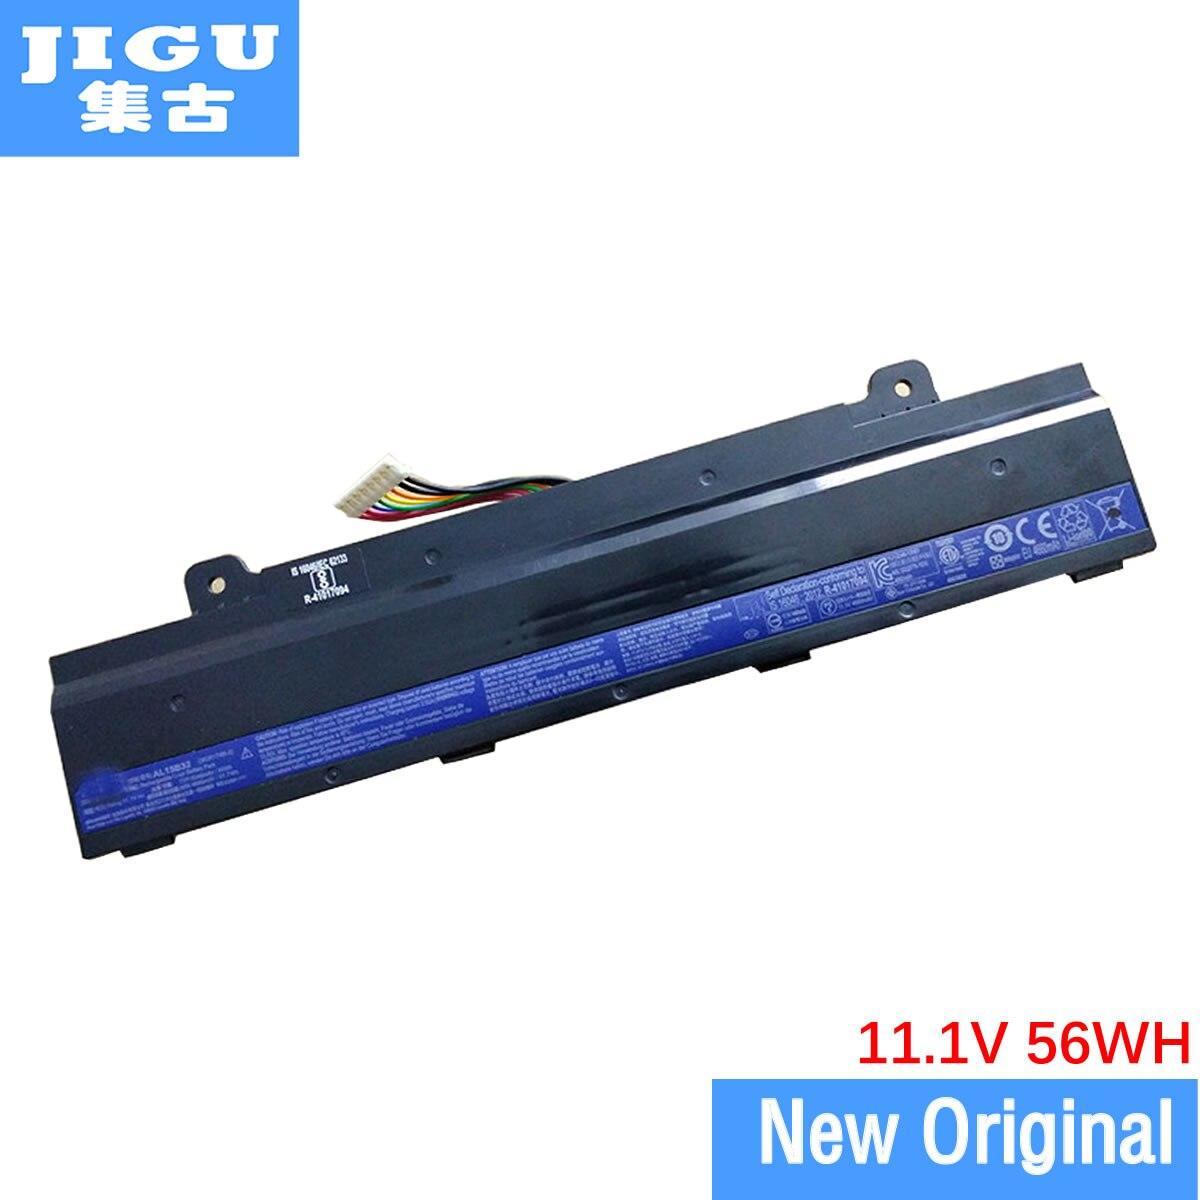 JIGU 11.1V 56WH 31CR17/65-2 AL15B32 Original Laptop Battery For ACER For Aspire V5-591G V5-591G